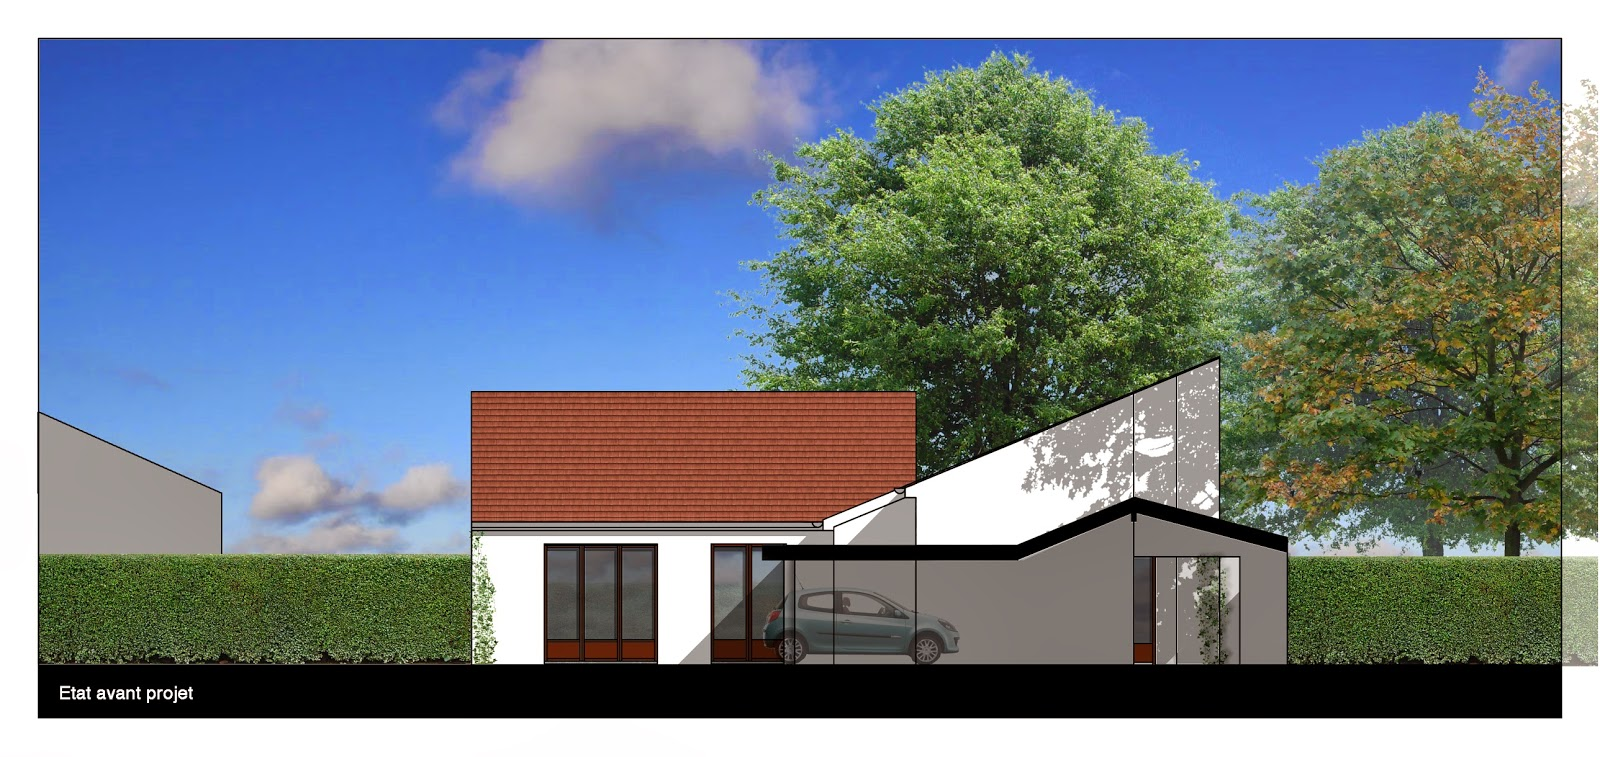 aubrey deriaud architecte. Black Bedroom Furniture Sets. Home Design Ideas